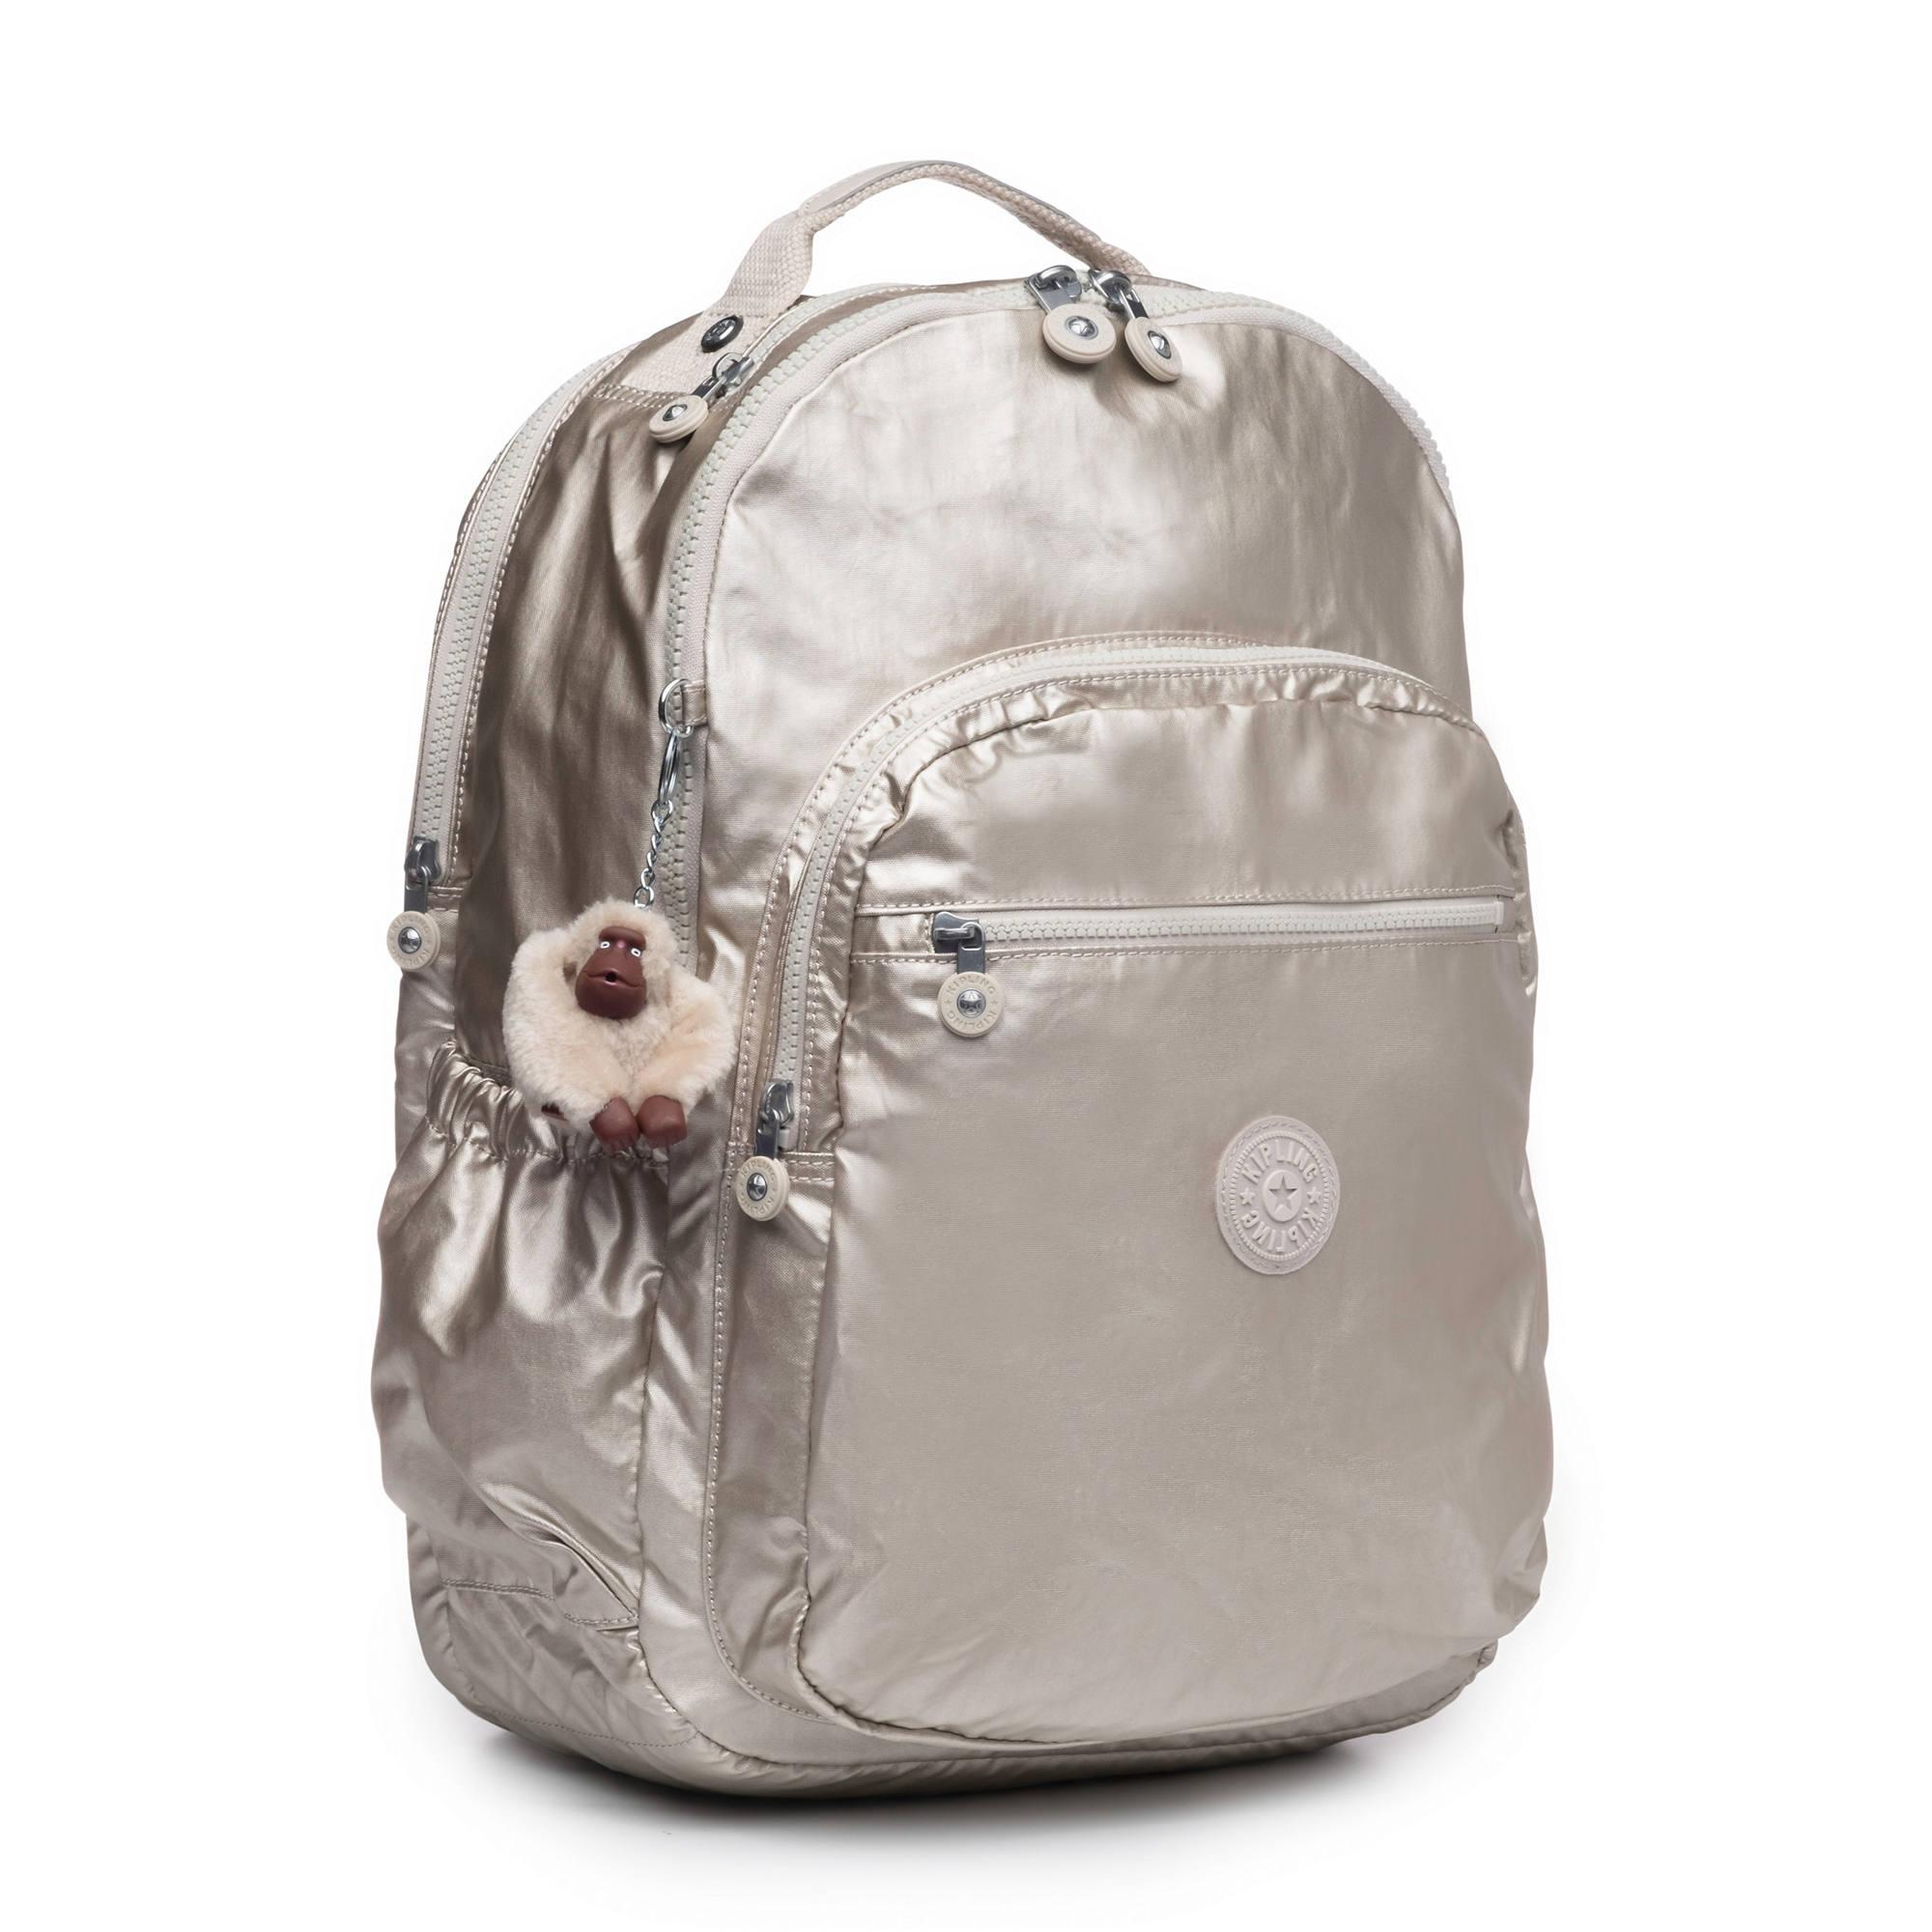 3547d4e0c Seoul Go Extra Large Metallic Laptop Backpack,Cloud Grey Metallic,large